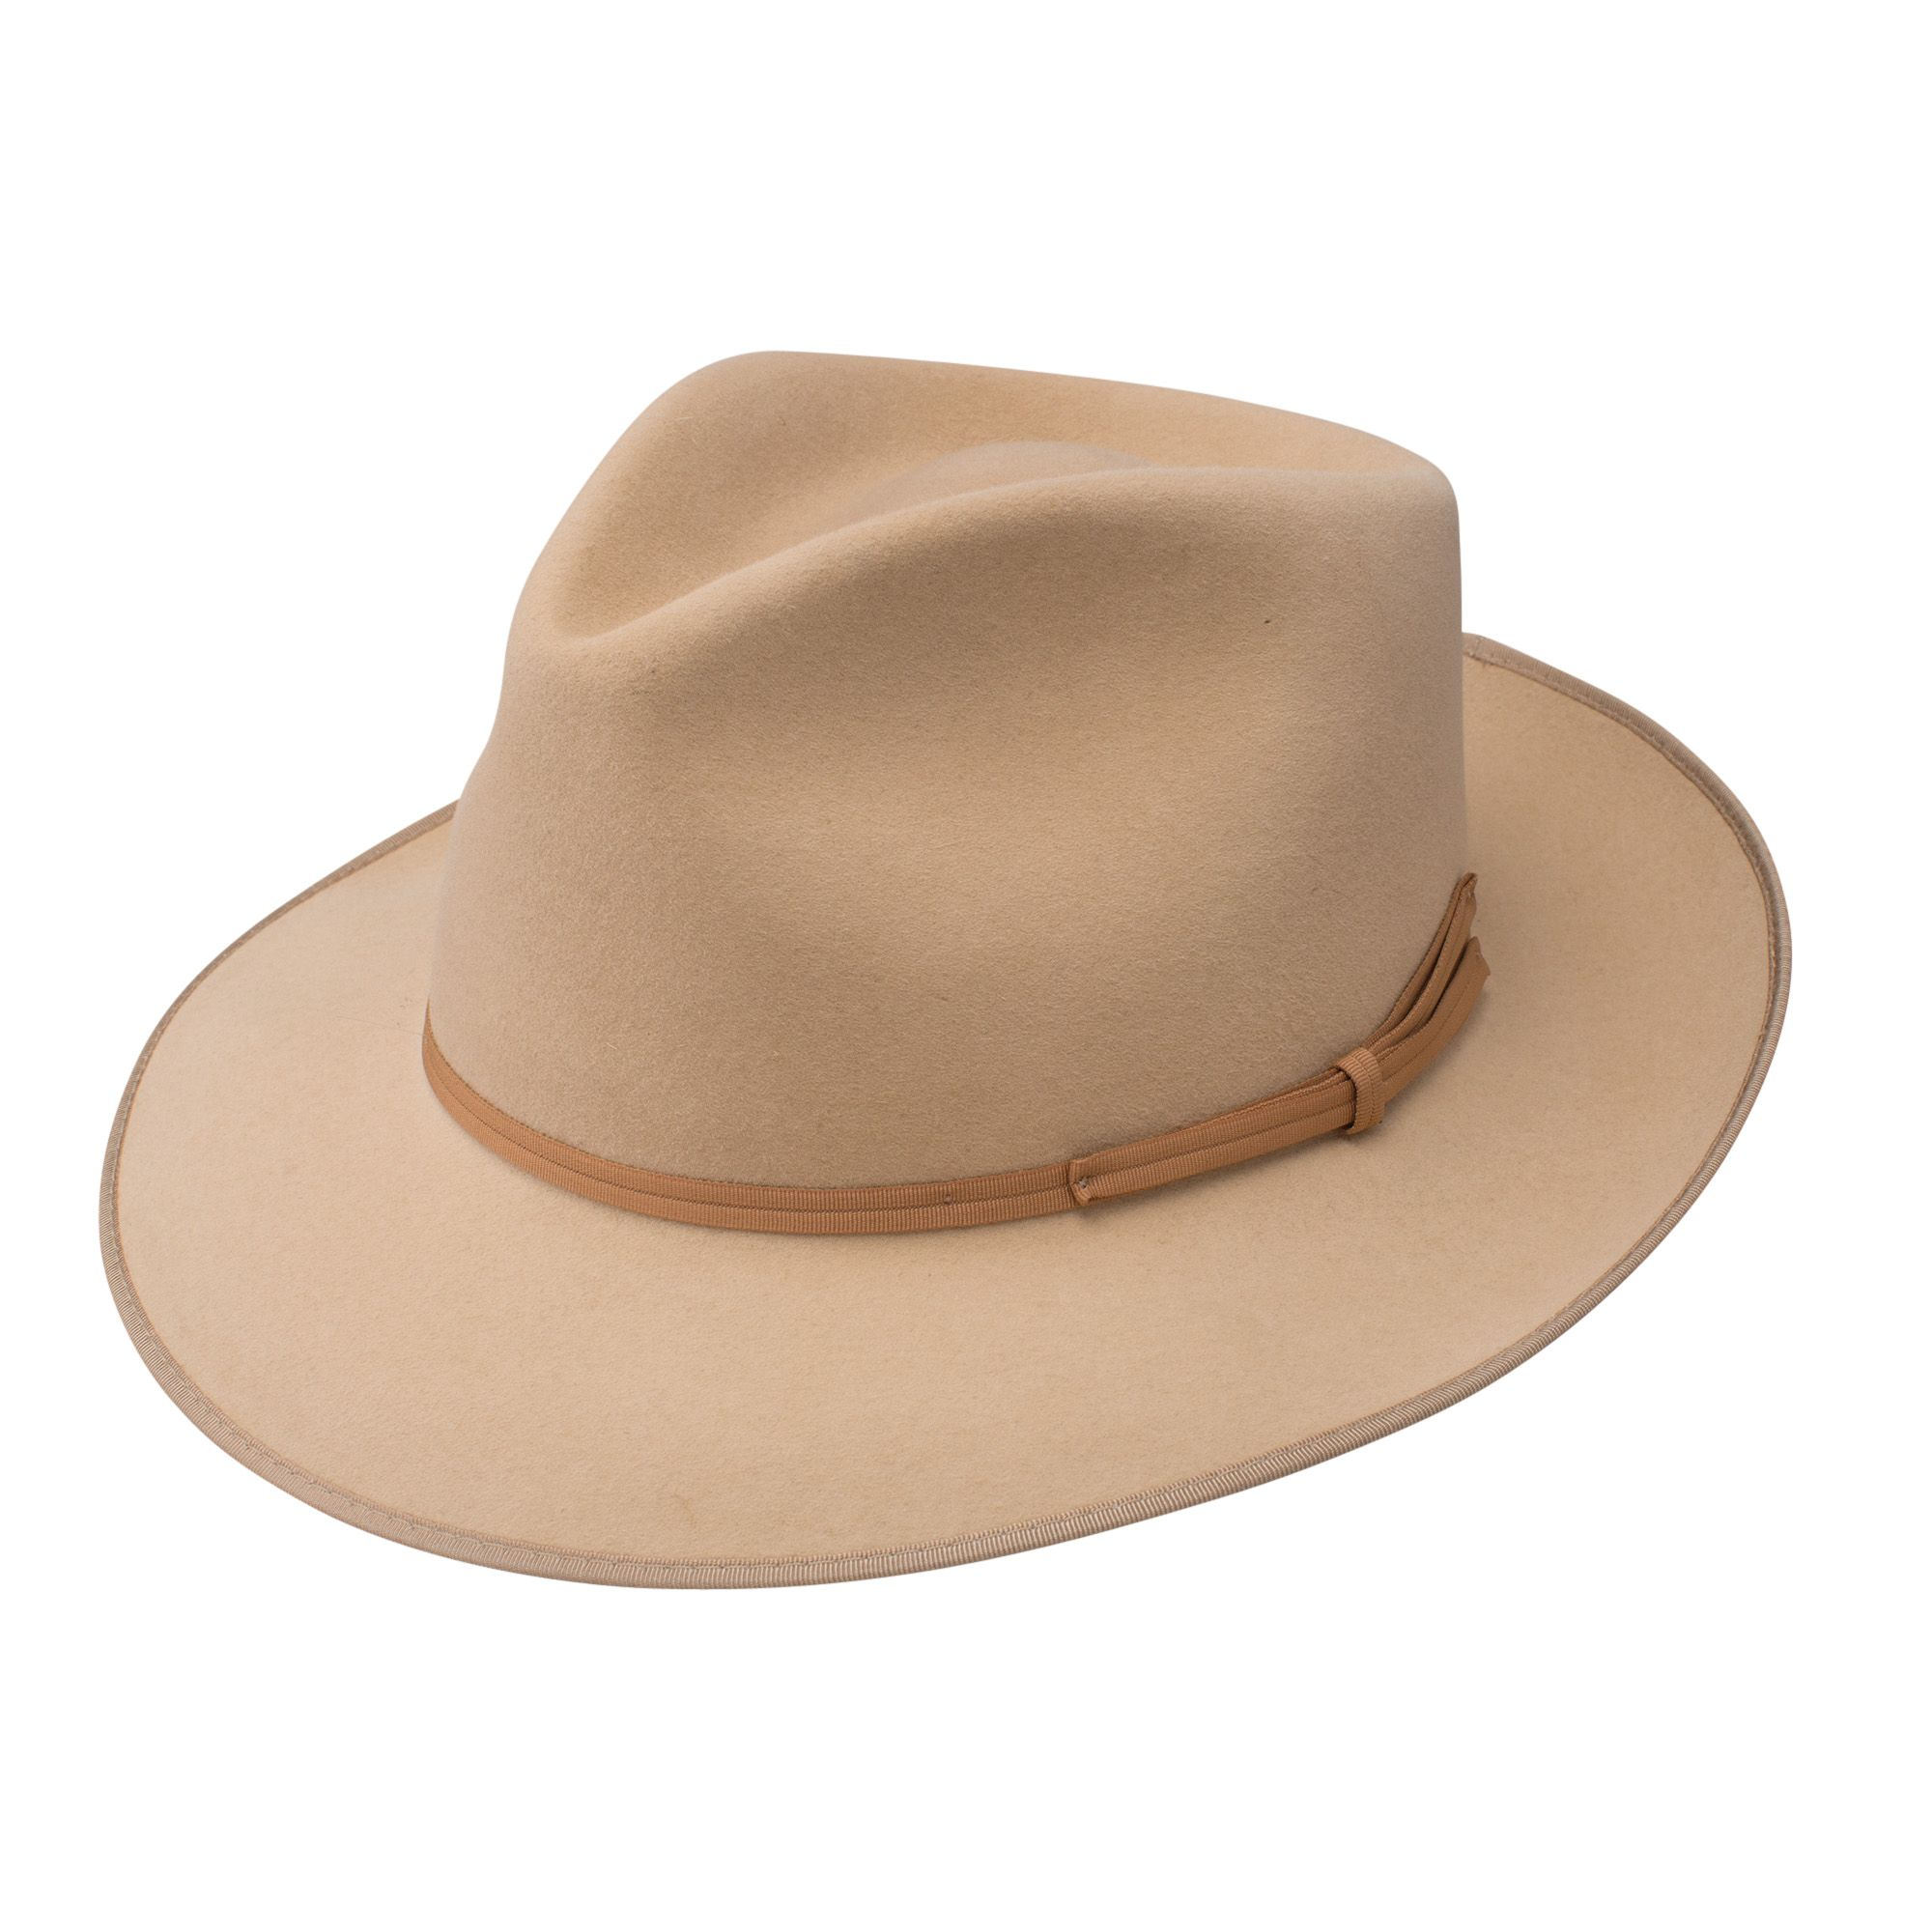 b9ed59badcebd Shore Club Stylish Hats